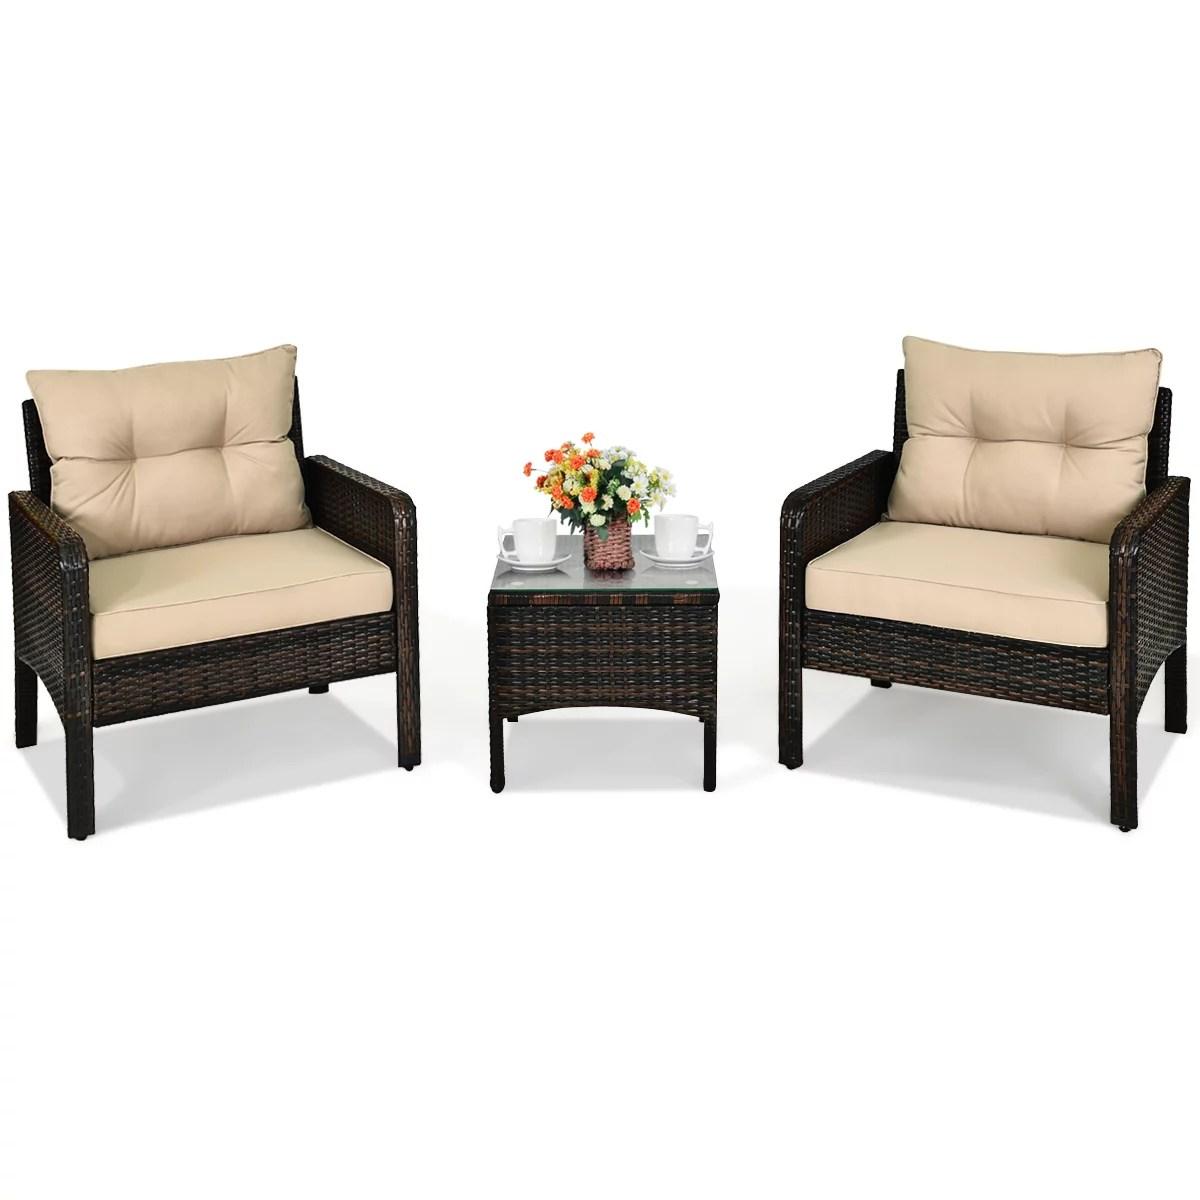 costway 3pcs outdoor rattan conversation set patio garden cushioned sofa chair turquoise